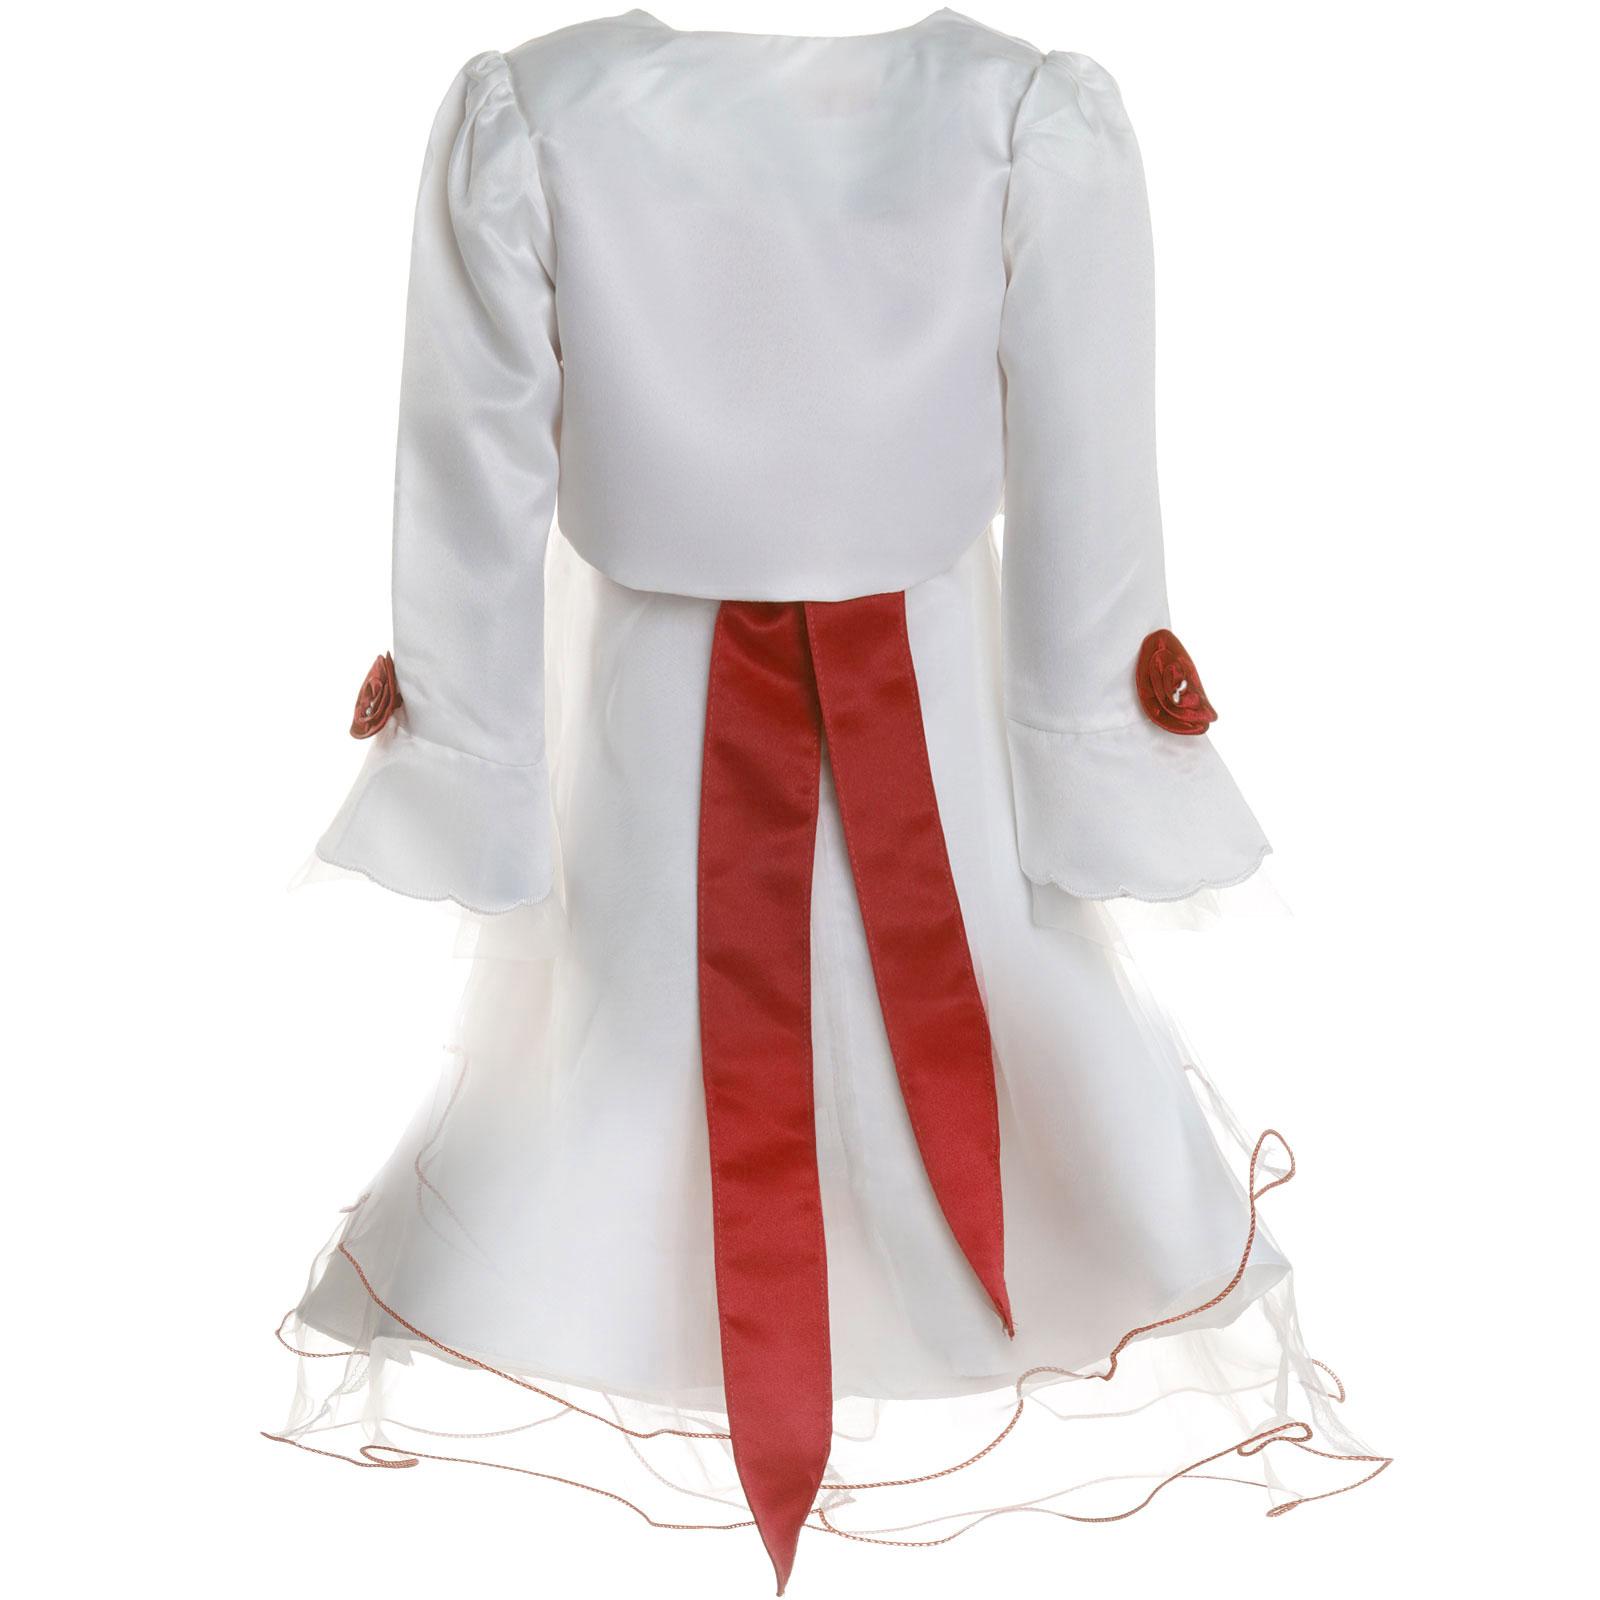 Maedchen-Kinder-Kleid-Peticoat-Festkleid-Lang-Arm-Kostuem-mit-Bolero-Rose-21476 Indexbild 3